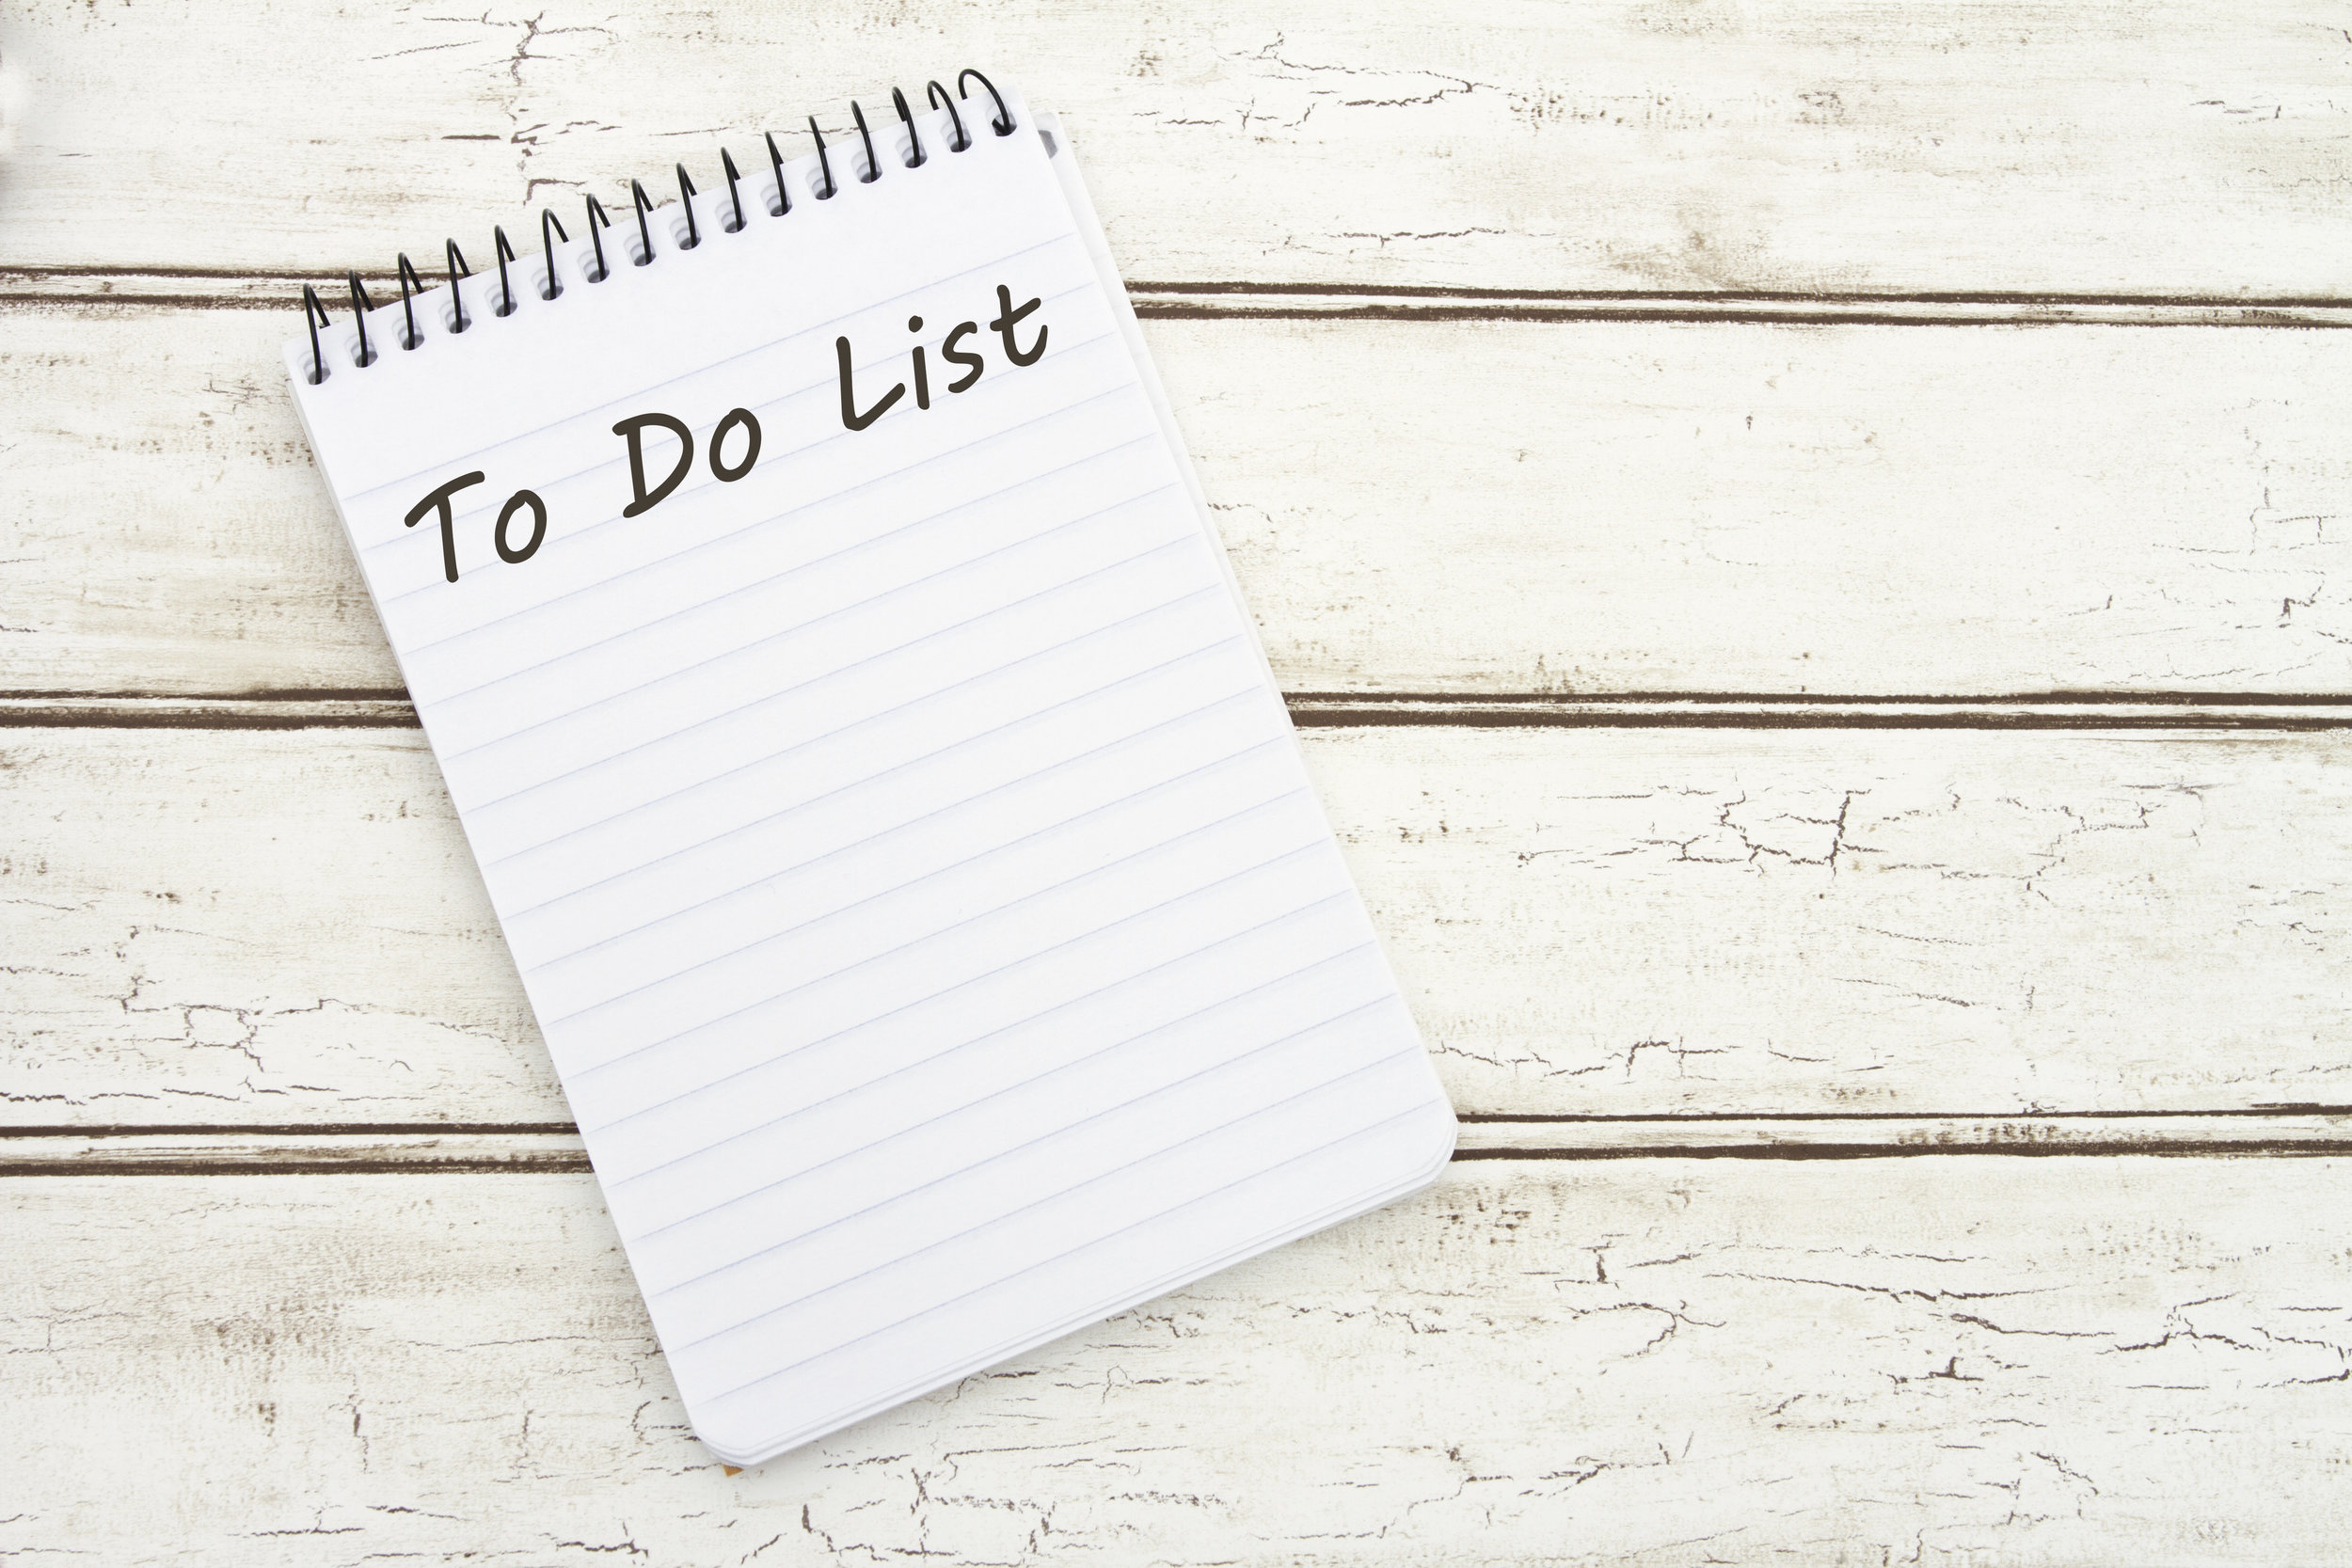 Career_change_to_do_list